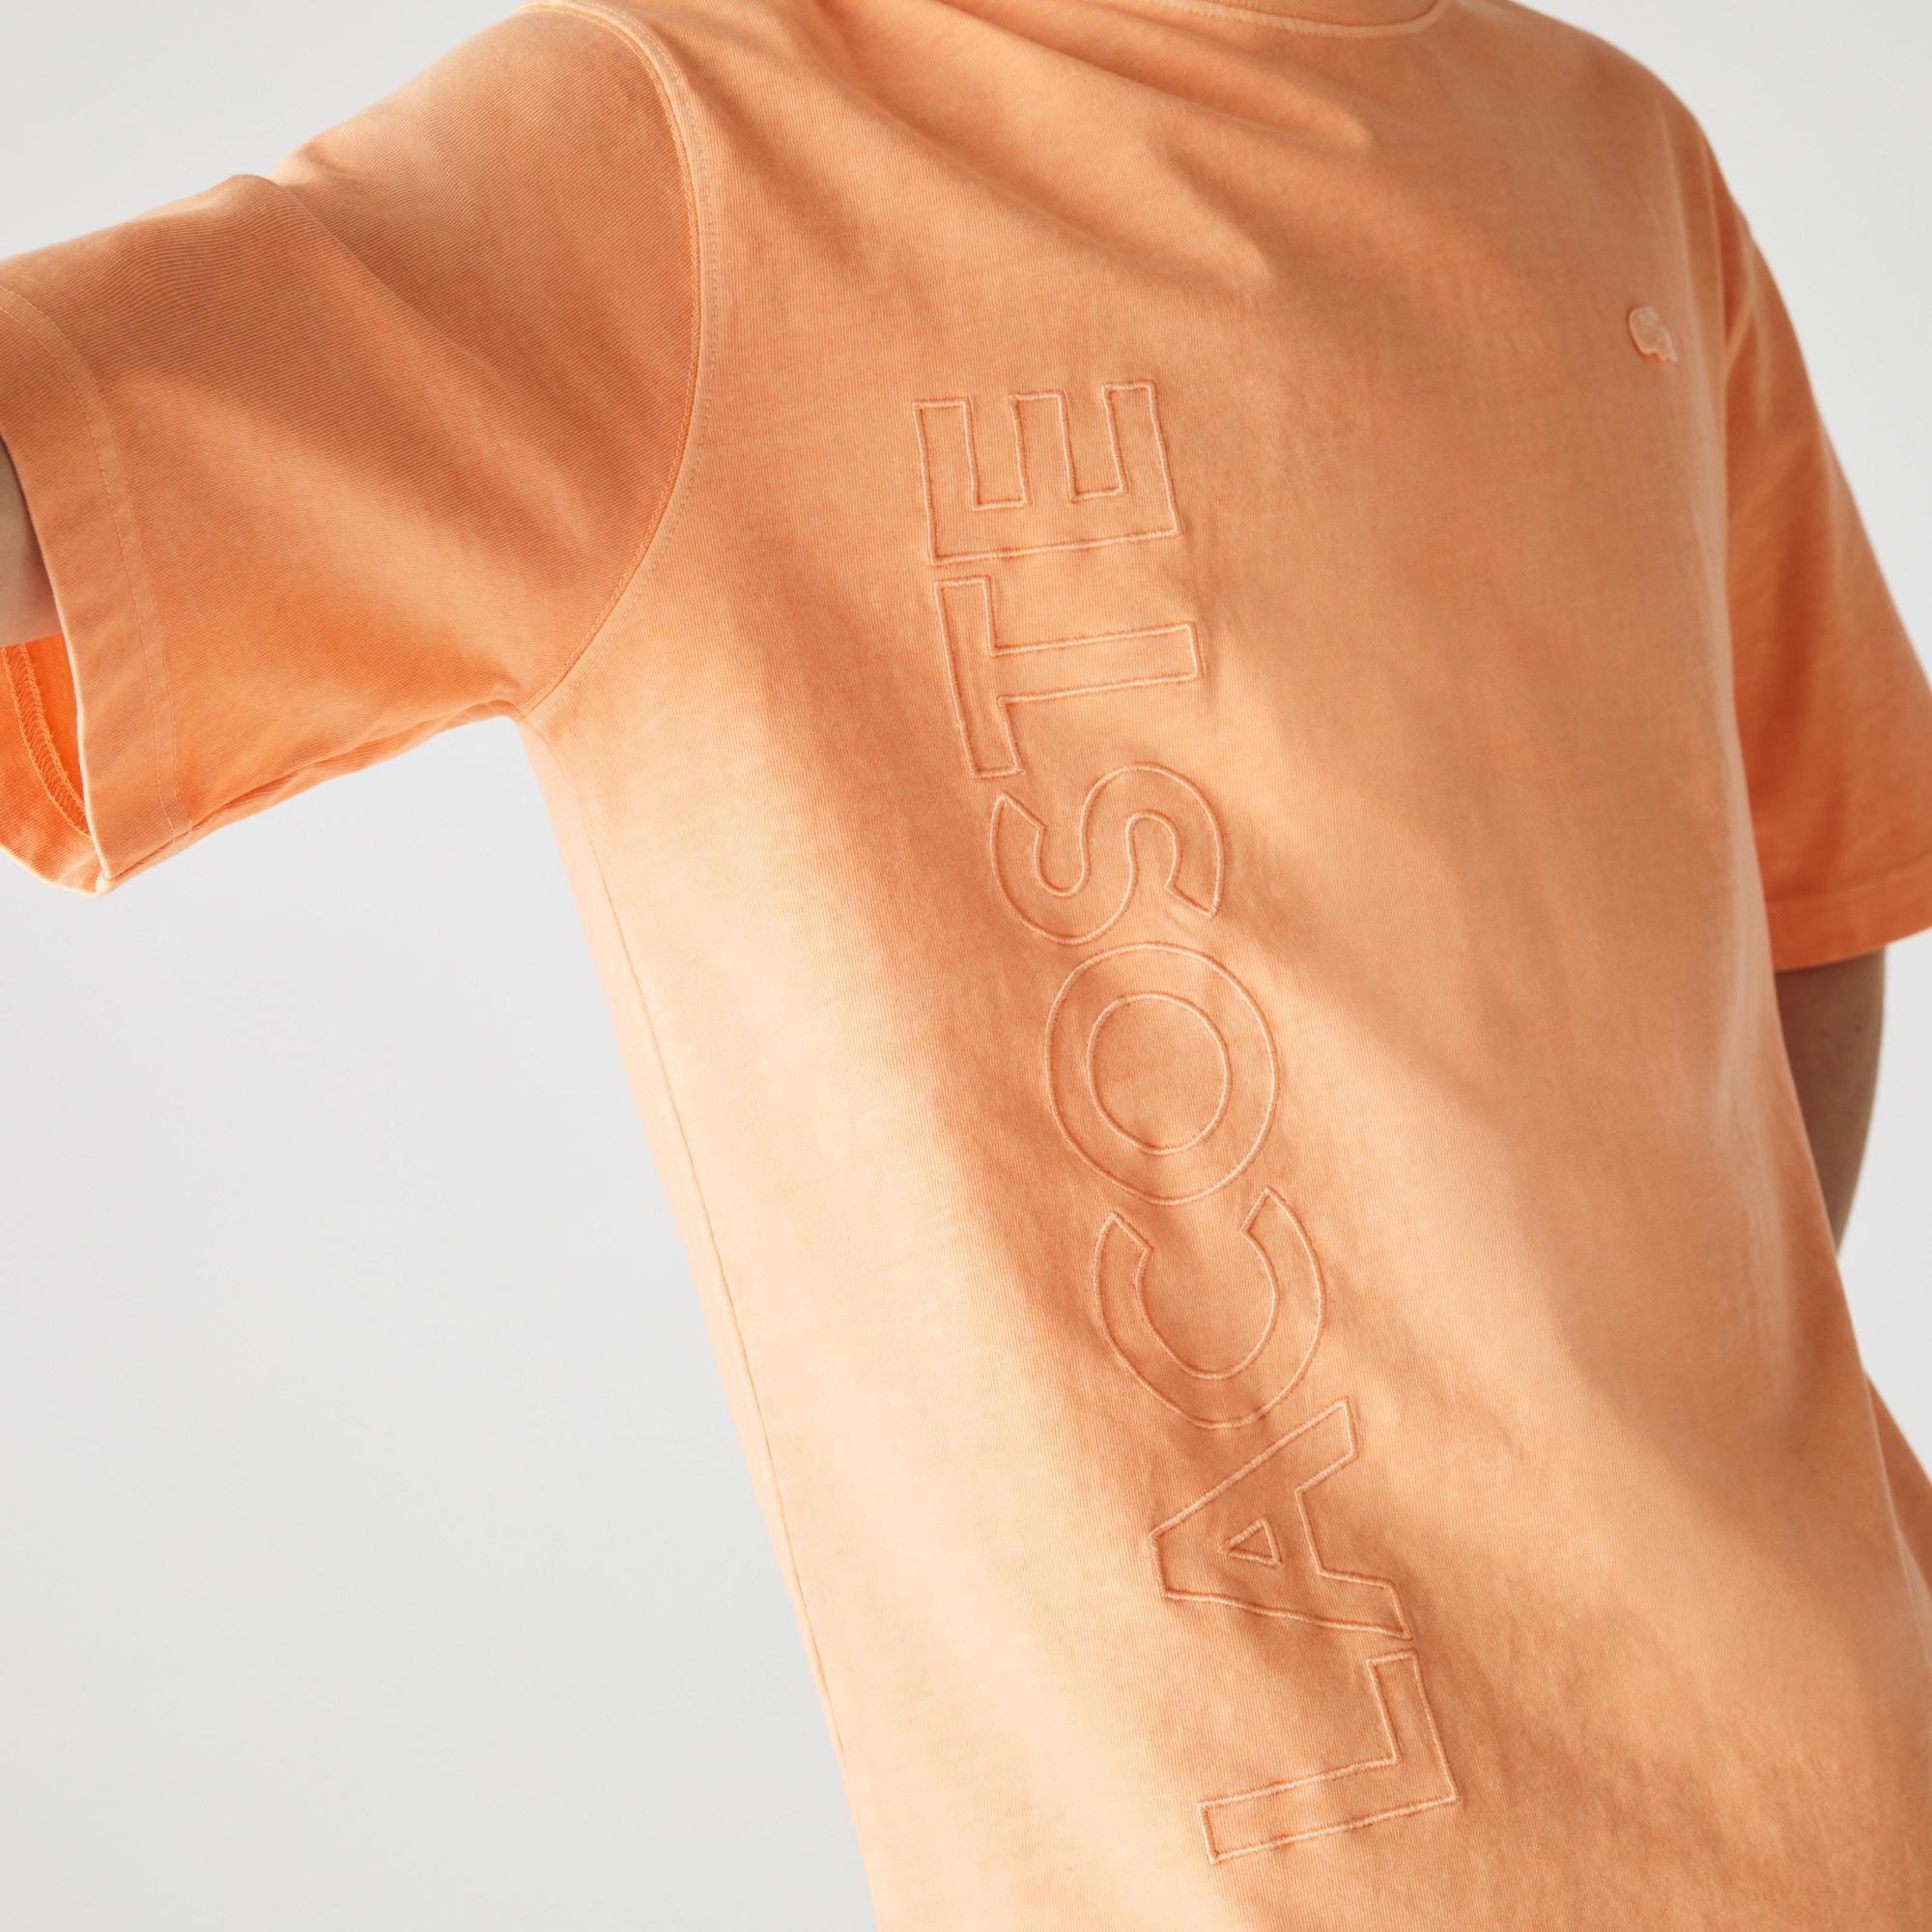 Lacoste L!ve Unisex Loose Fit Bisiklet Yaka Baskılı Açık Turuncu T-Shirt